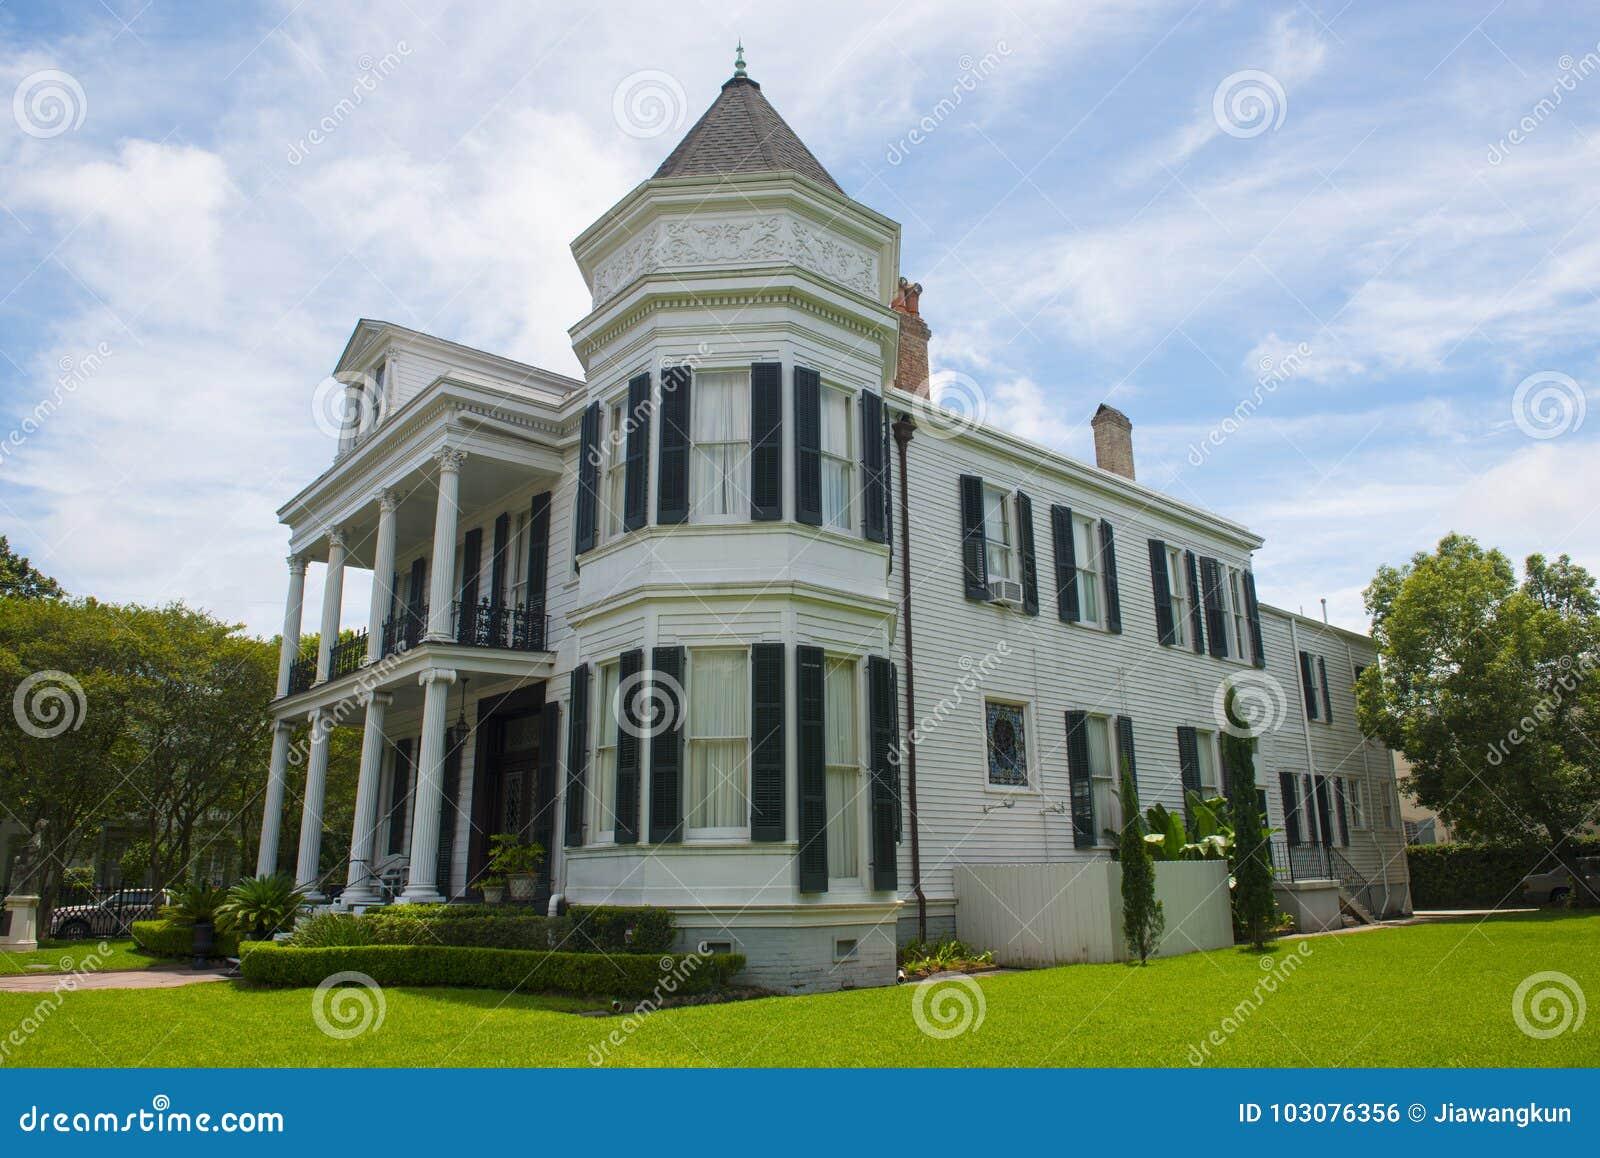 Opern-Innungs-Haus, Garten-Bezirk, New Orleans